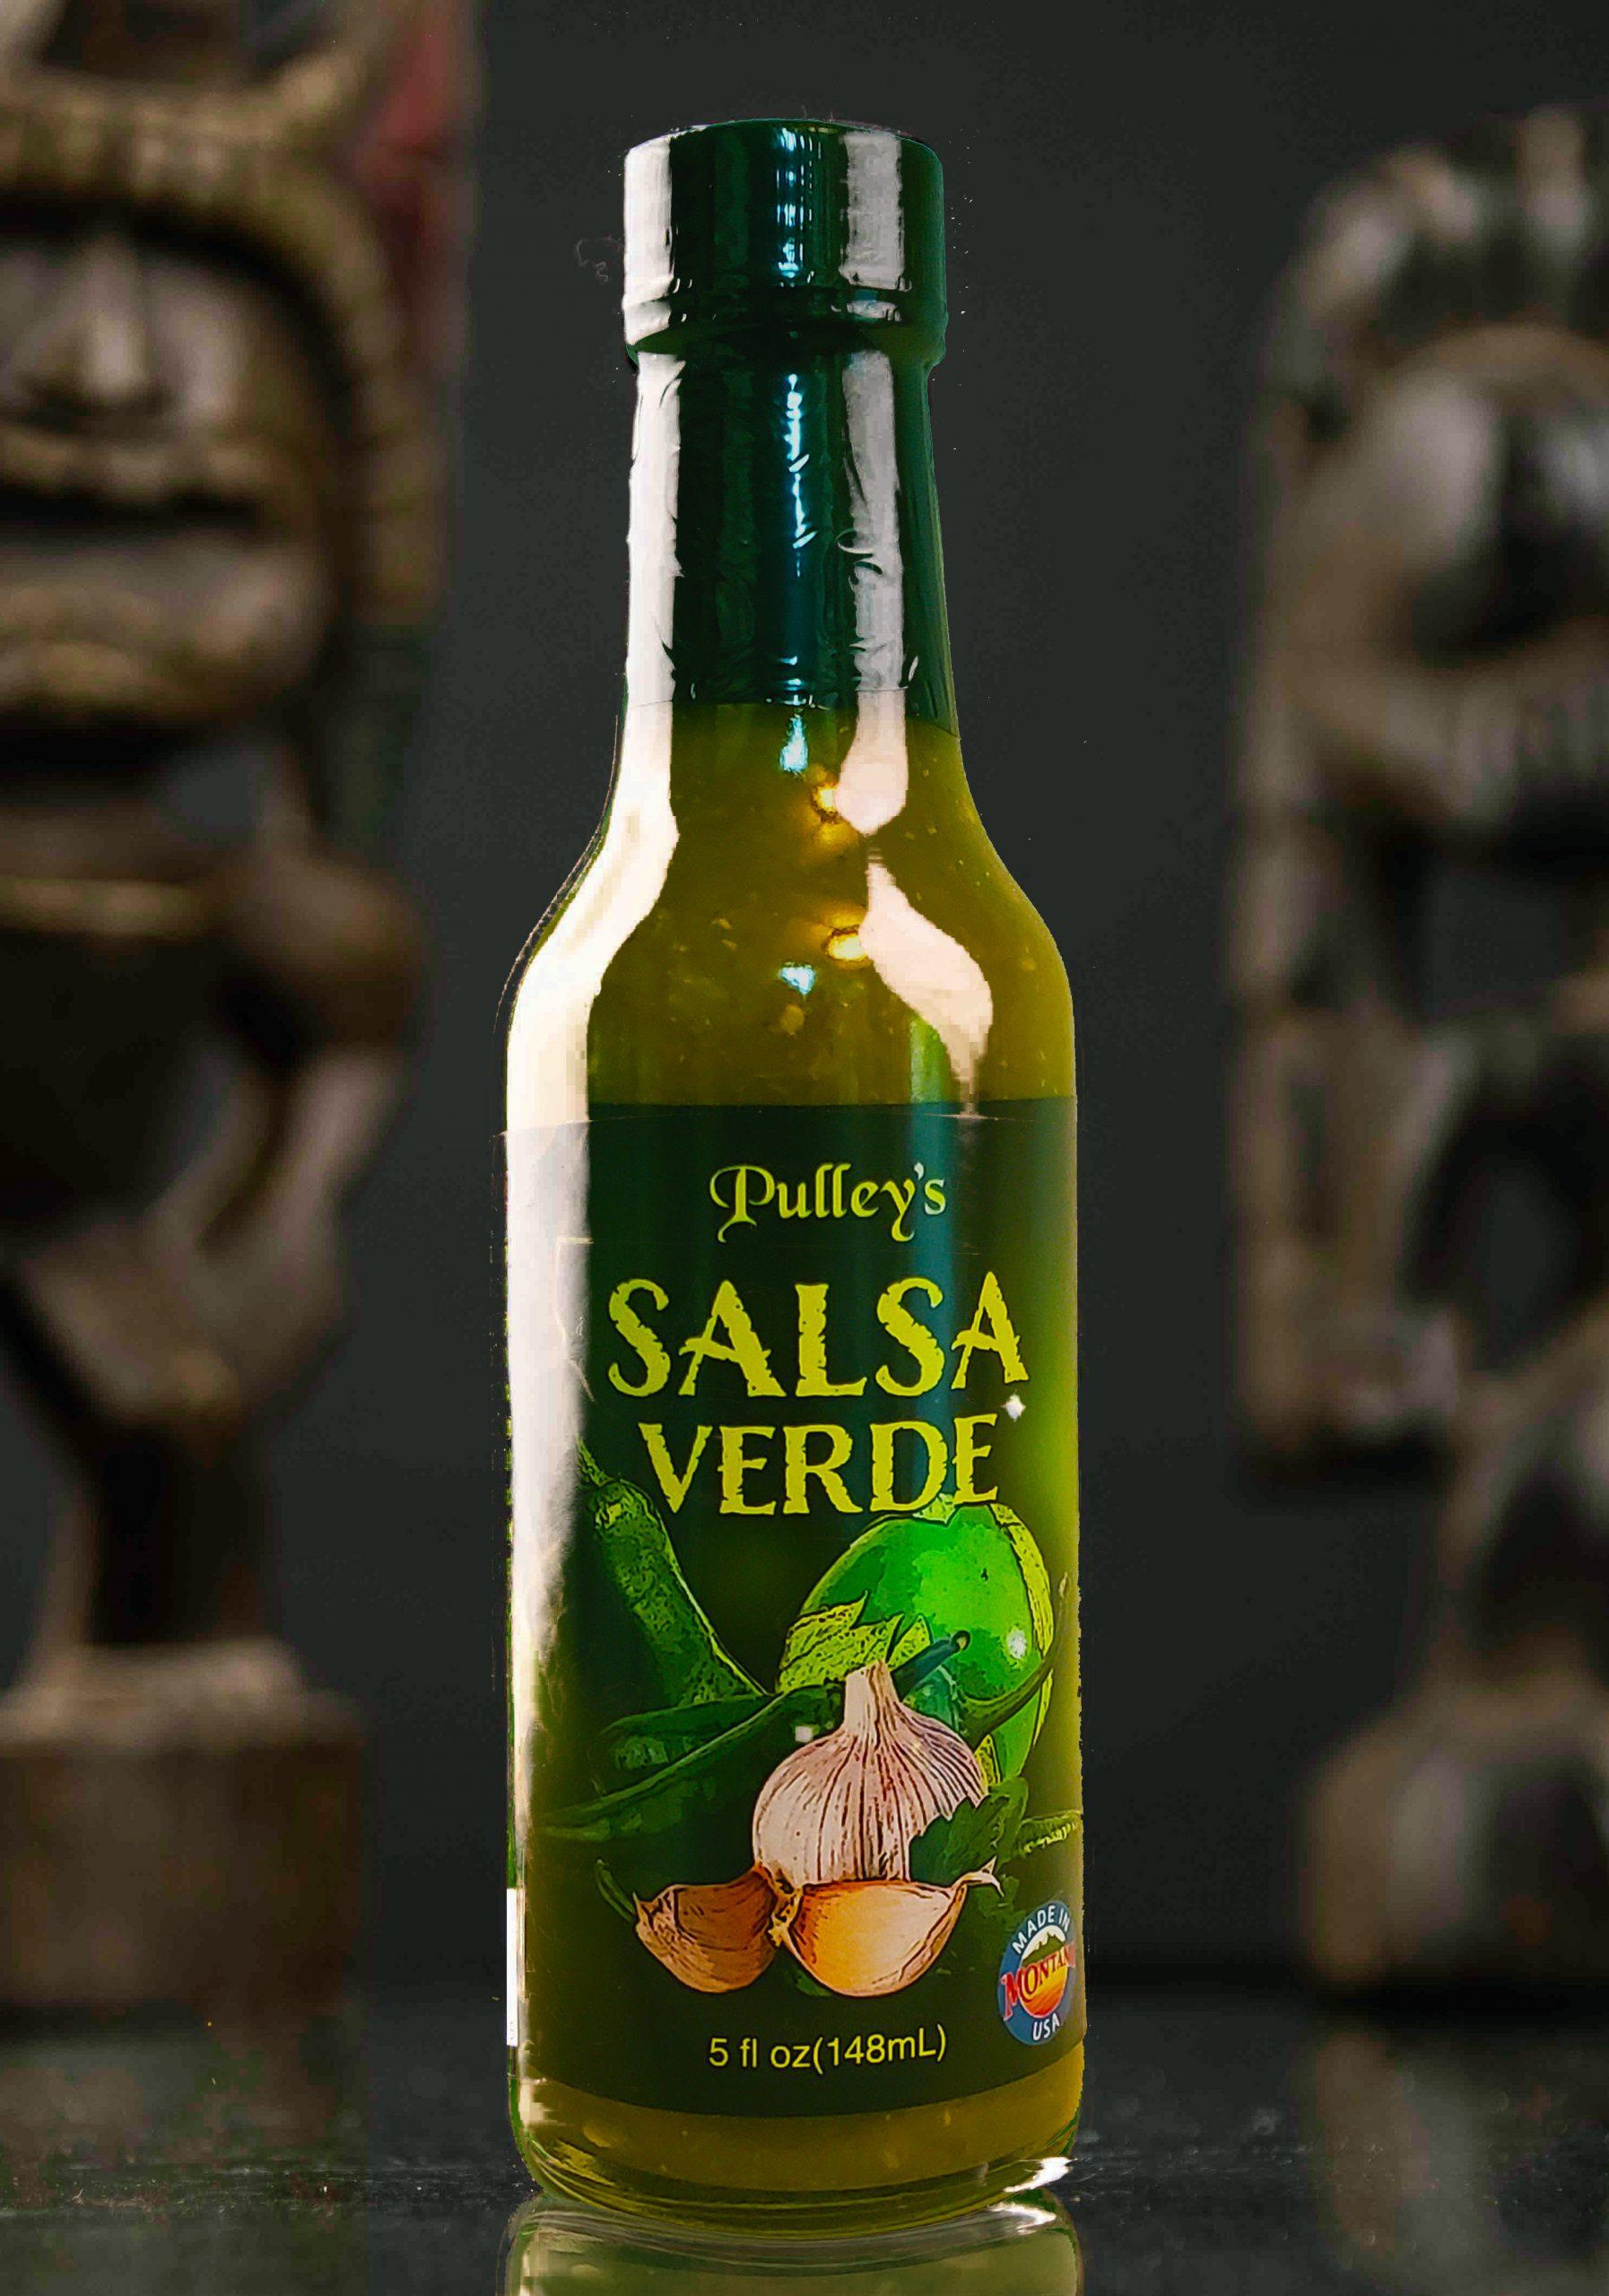 Pulley's Salsa Verde